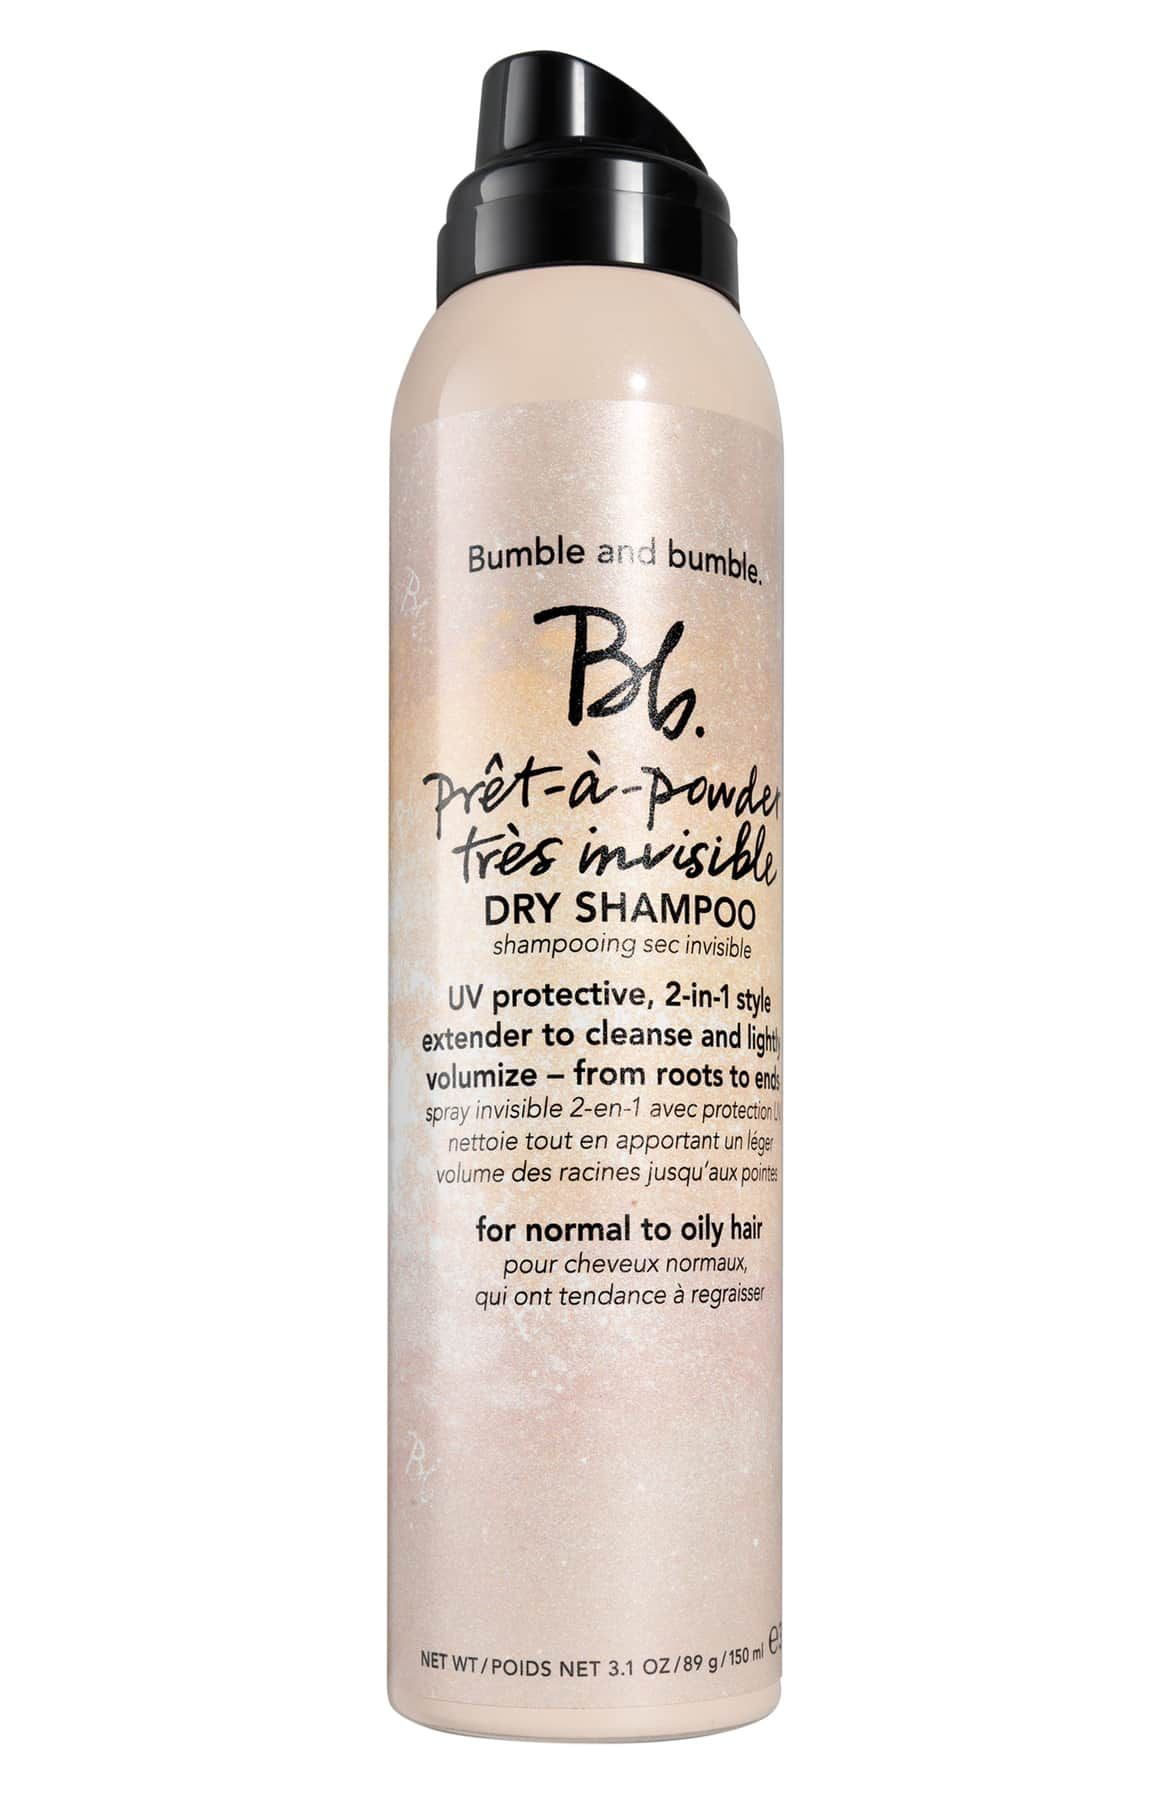 Diy Dry Shampoo Whole Foods Market Diy Dry Shampoo Dry Shampoo Homemade Hair Products